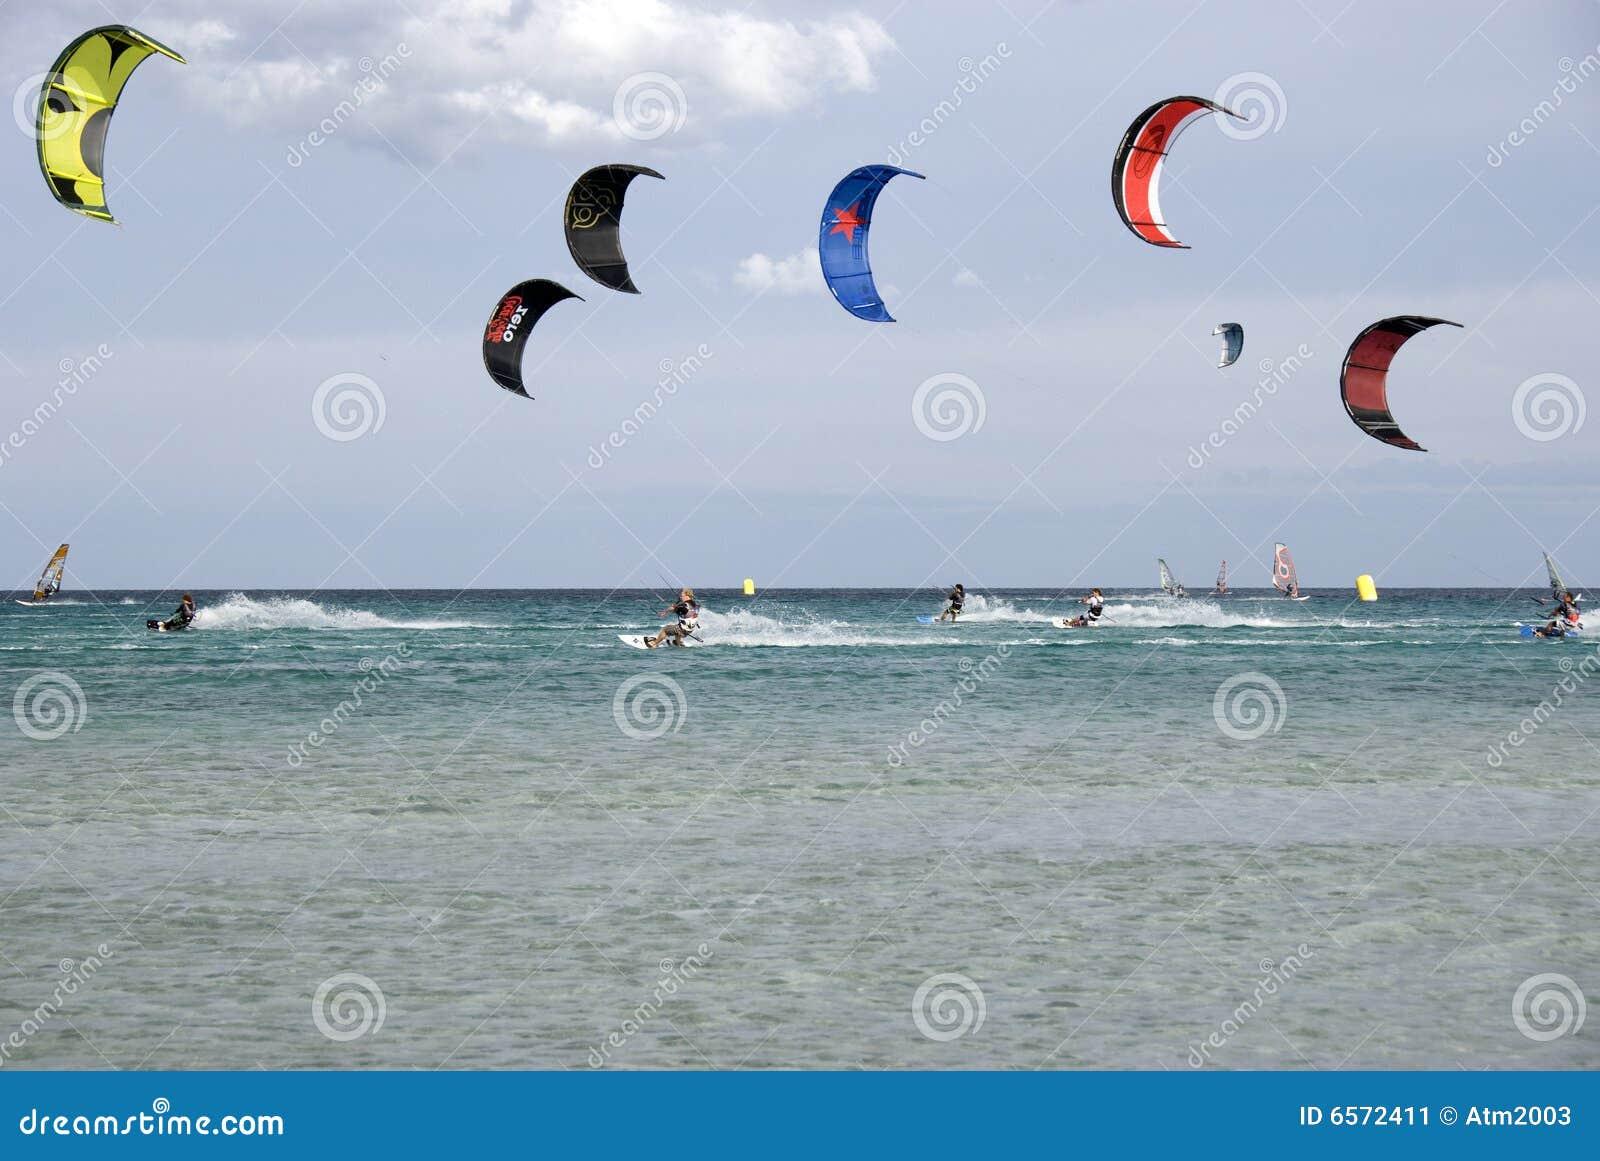 Kitesurf - The race